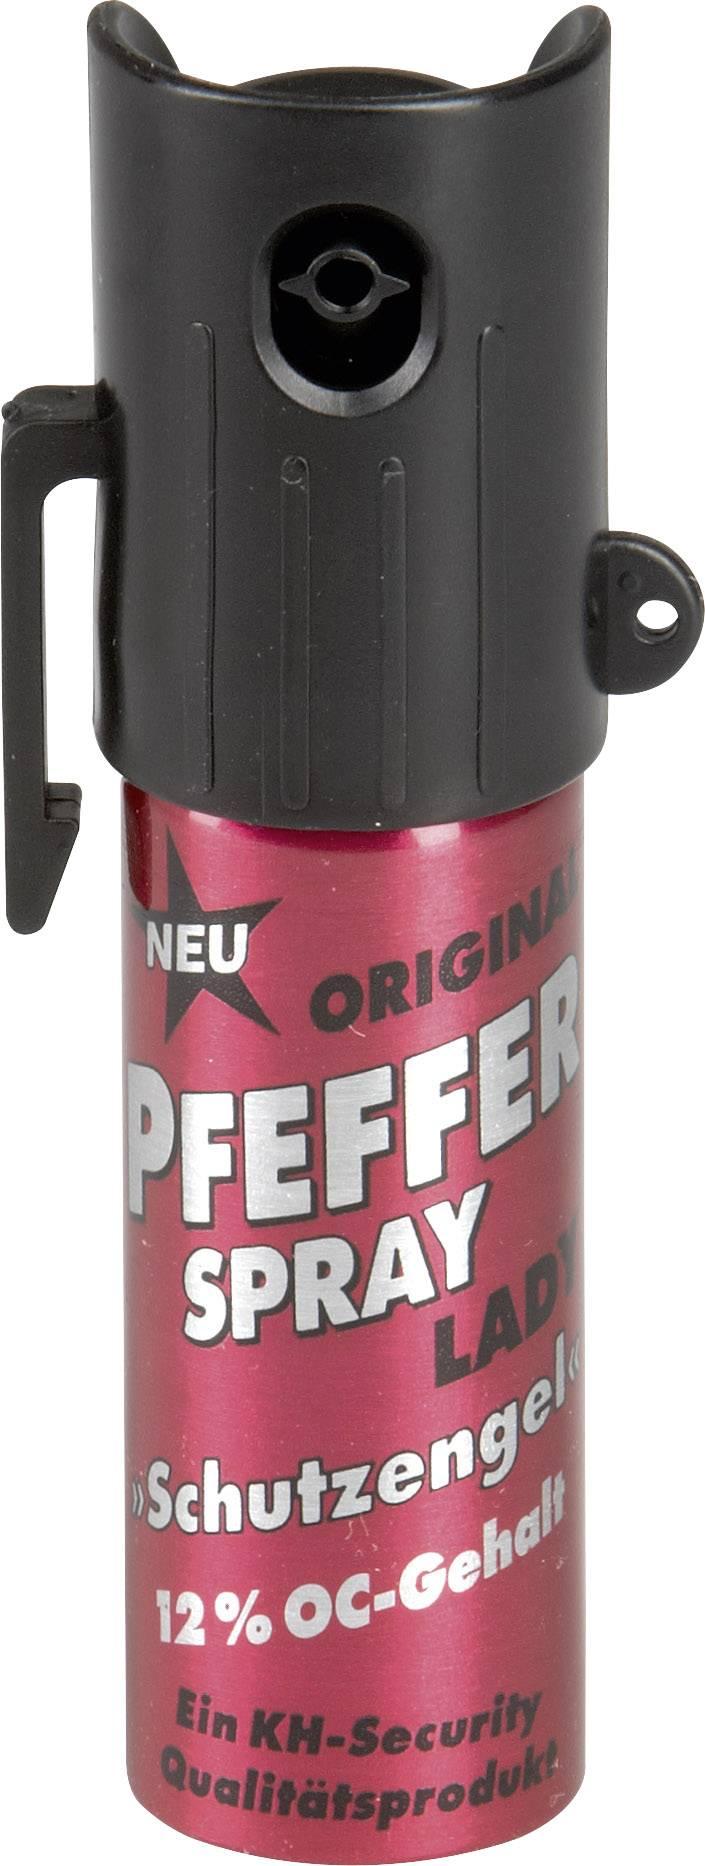 Pfefferspray 15 ml kh-security 130134